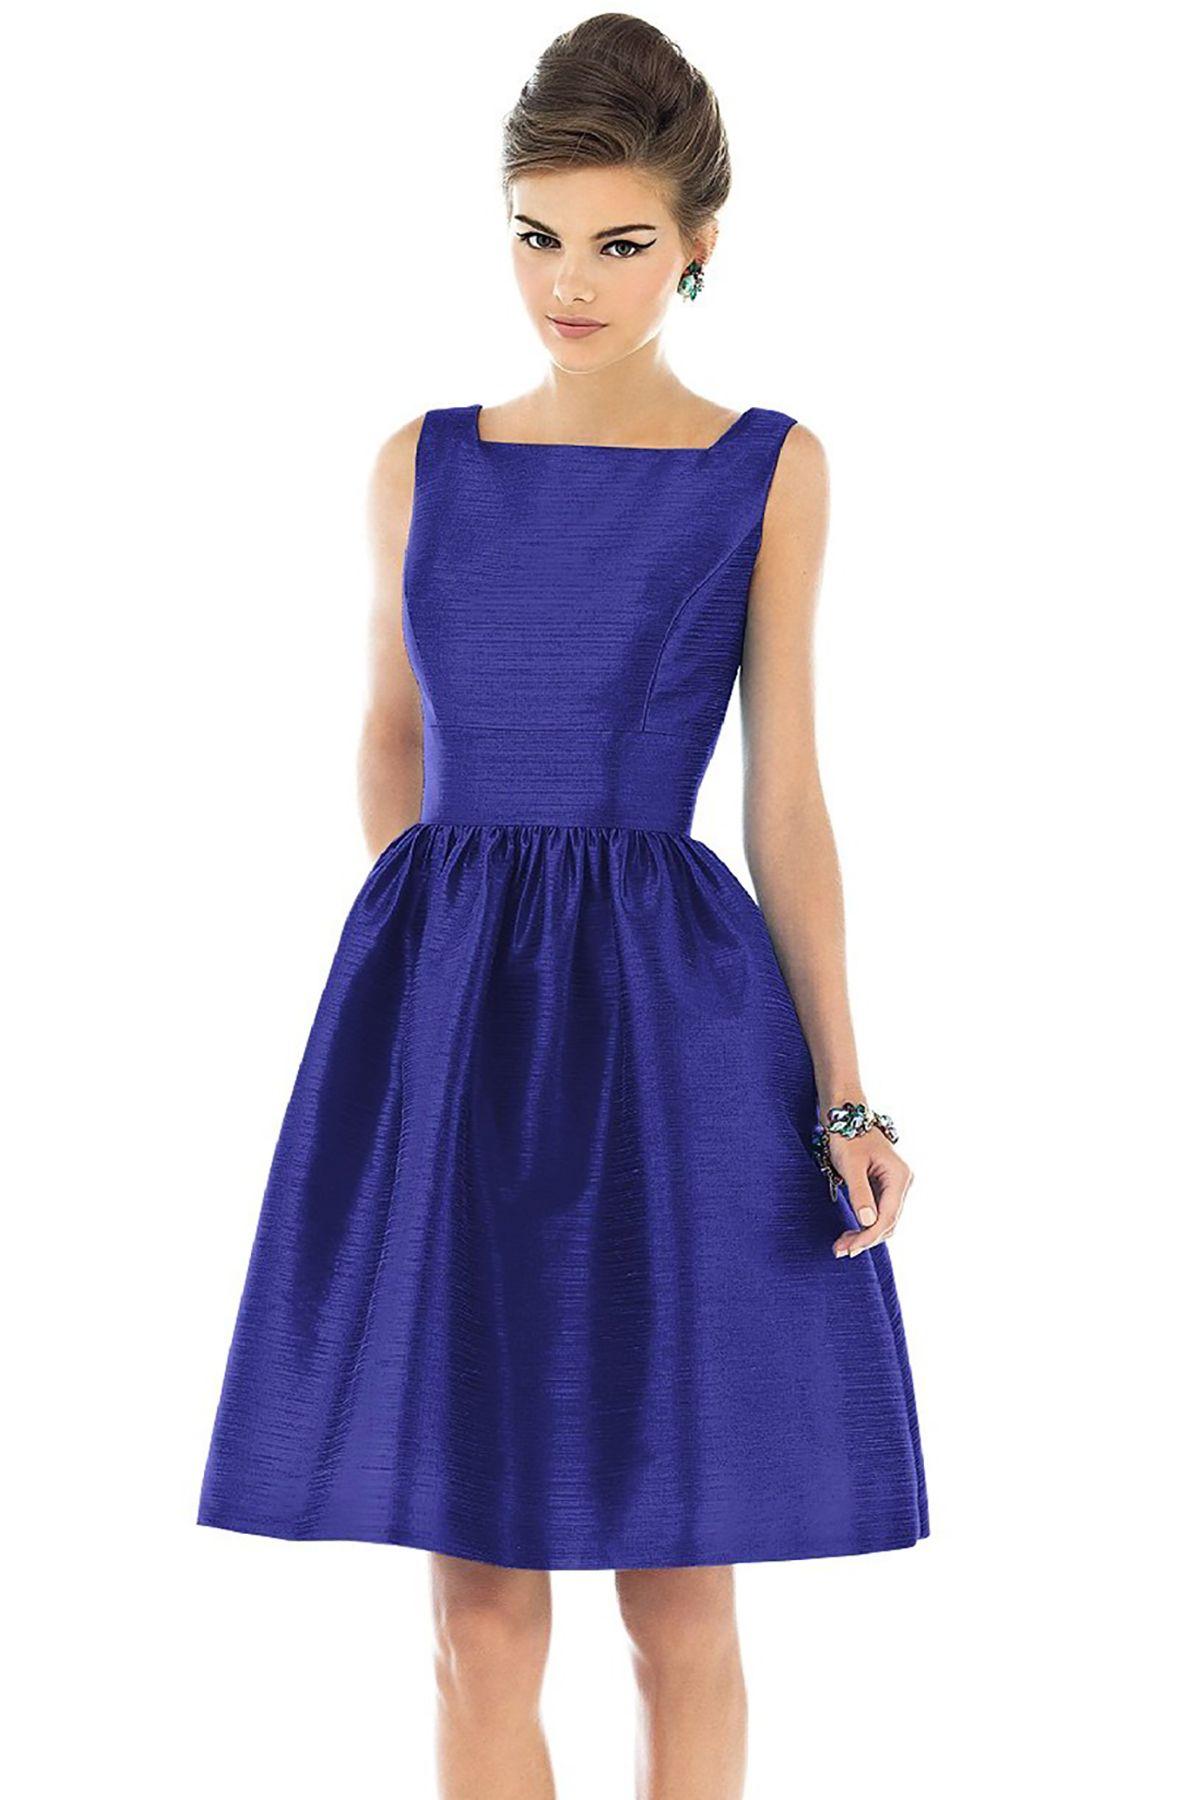 Shop Alfred Sung Bridesmaid Dress - D520 in Peau De Soie at ...